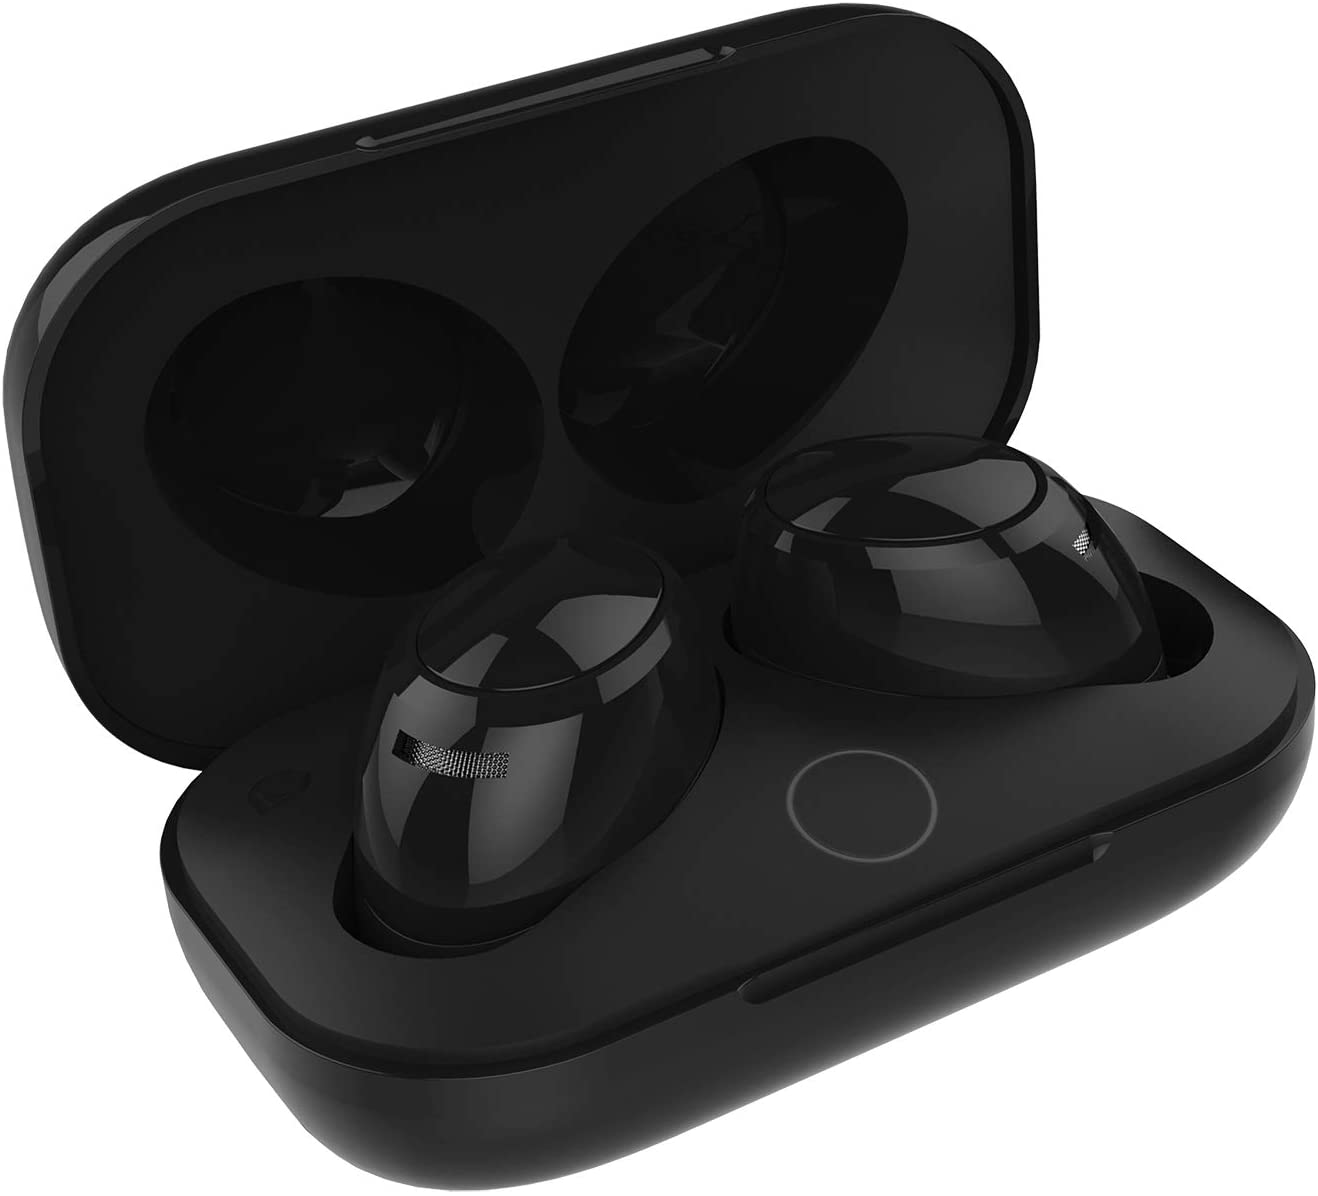 Celly-true Wireless Earbuds amazon